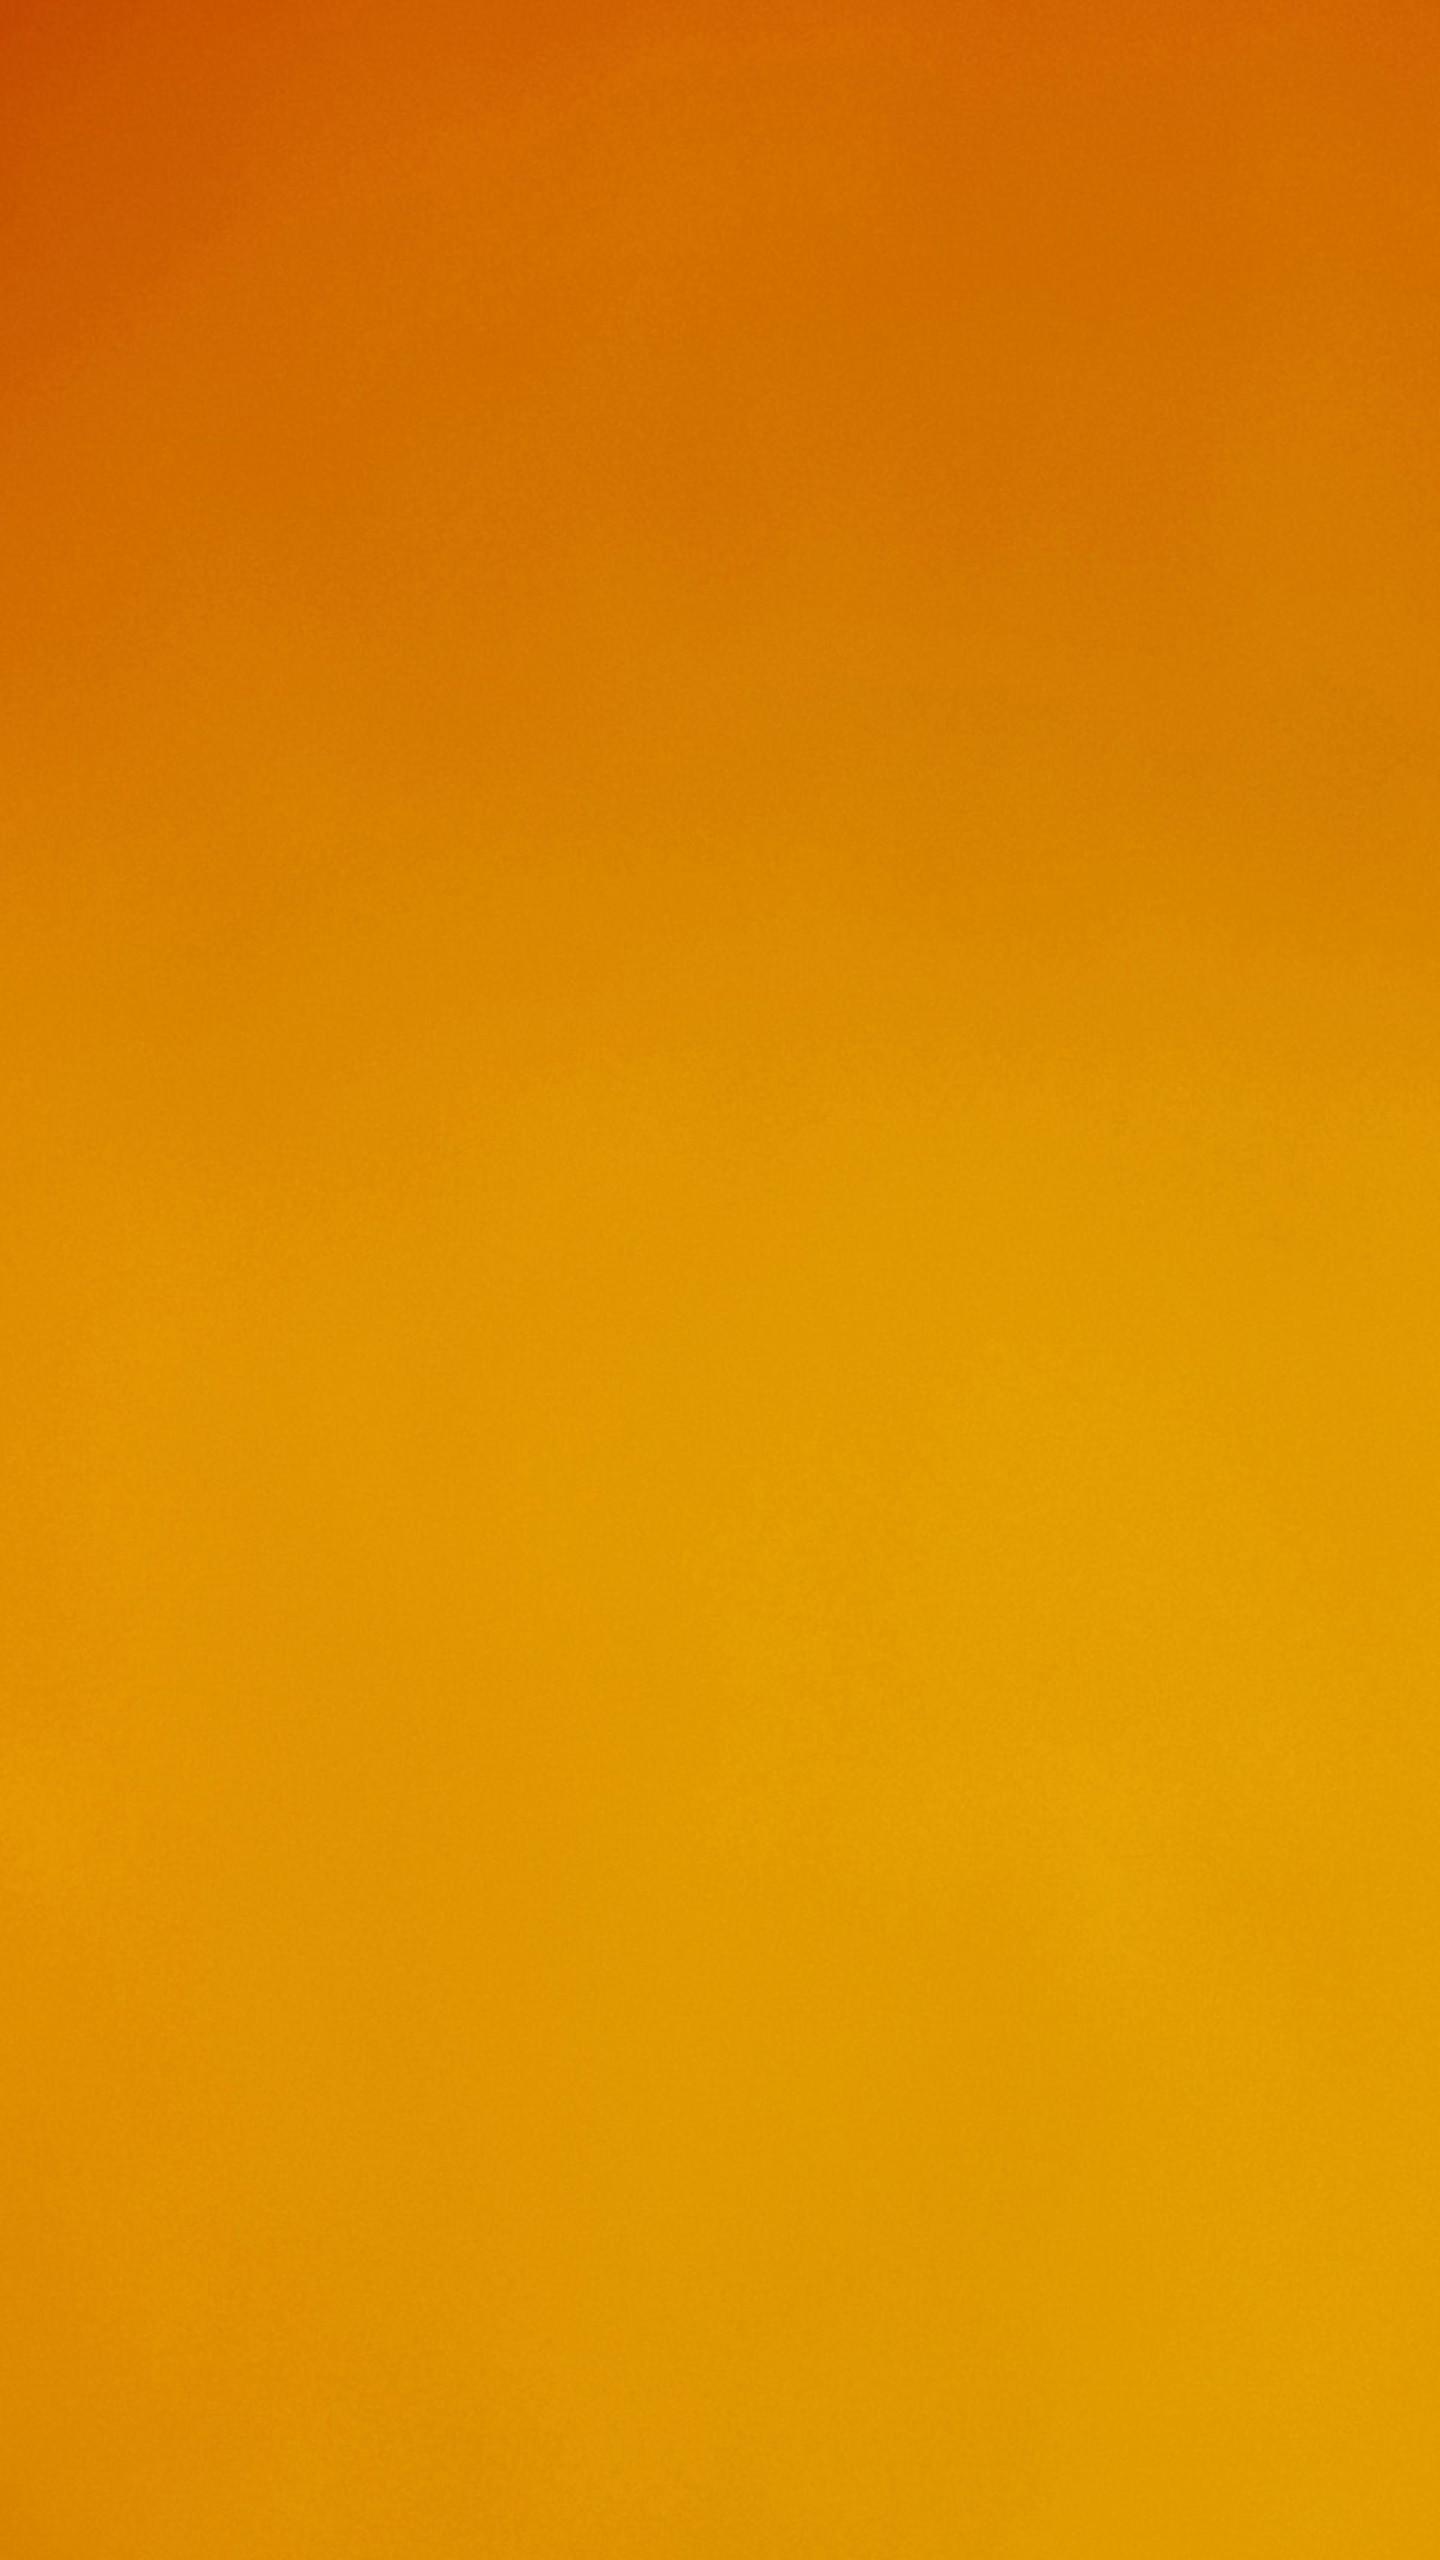 Yellow background 1 Galaxy S6 Wallpaper